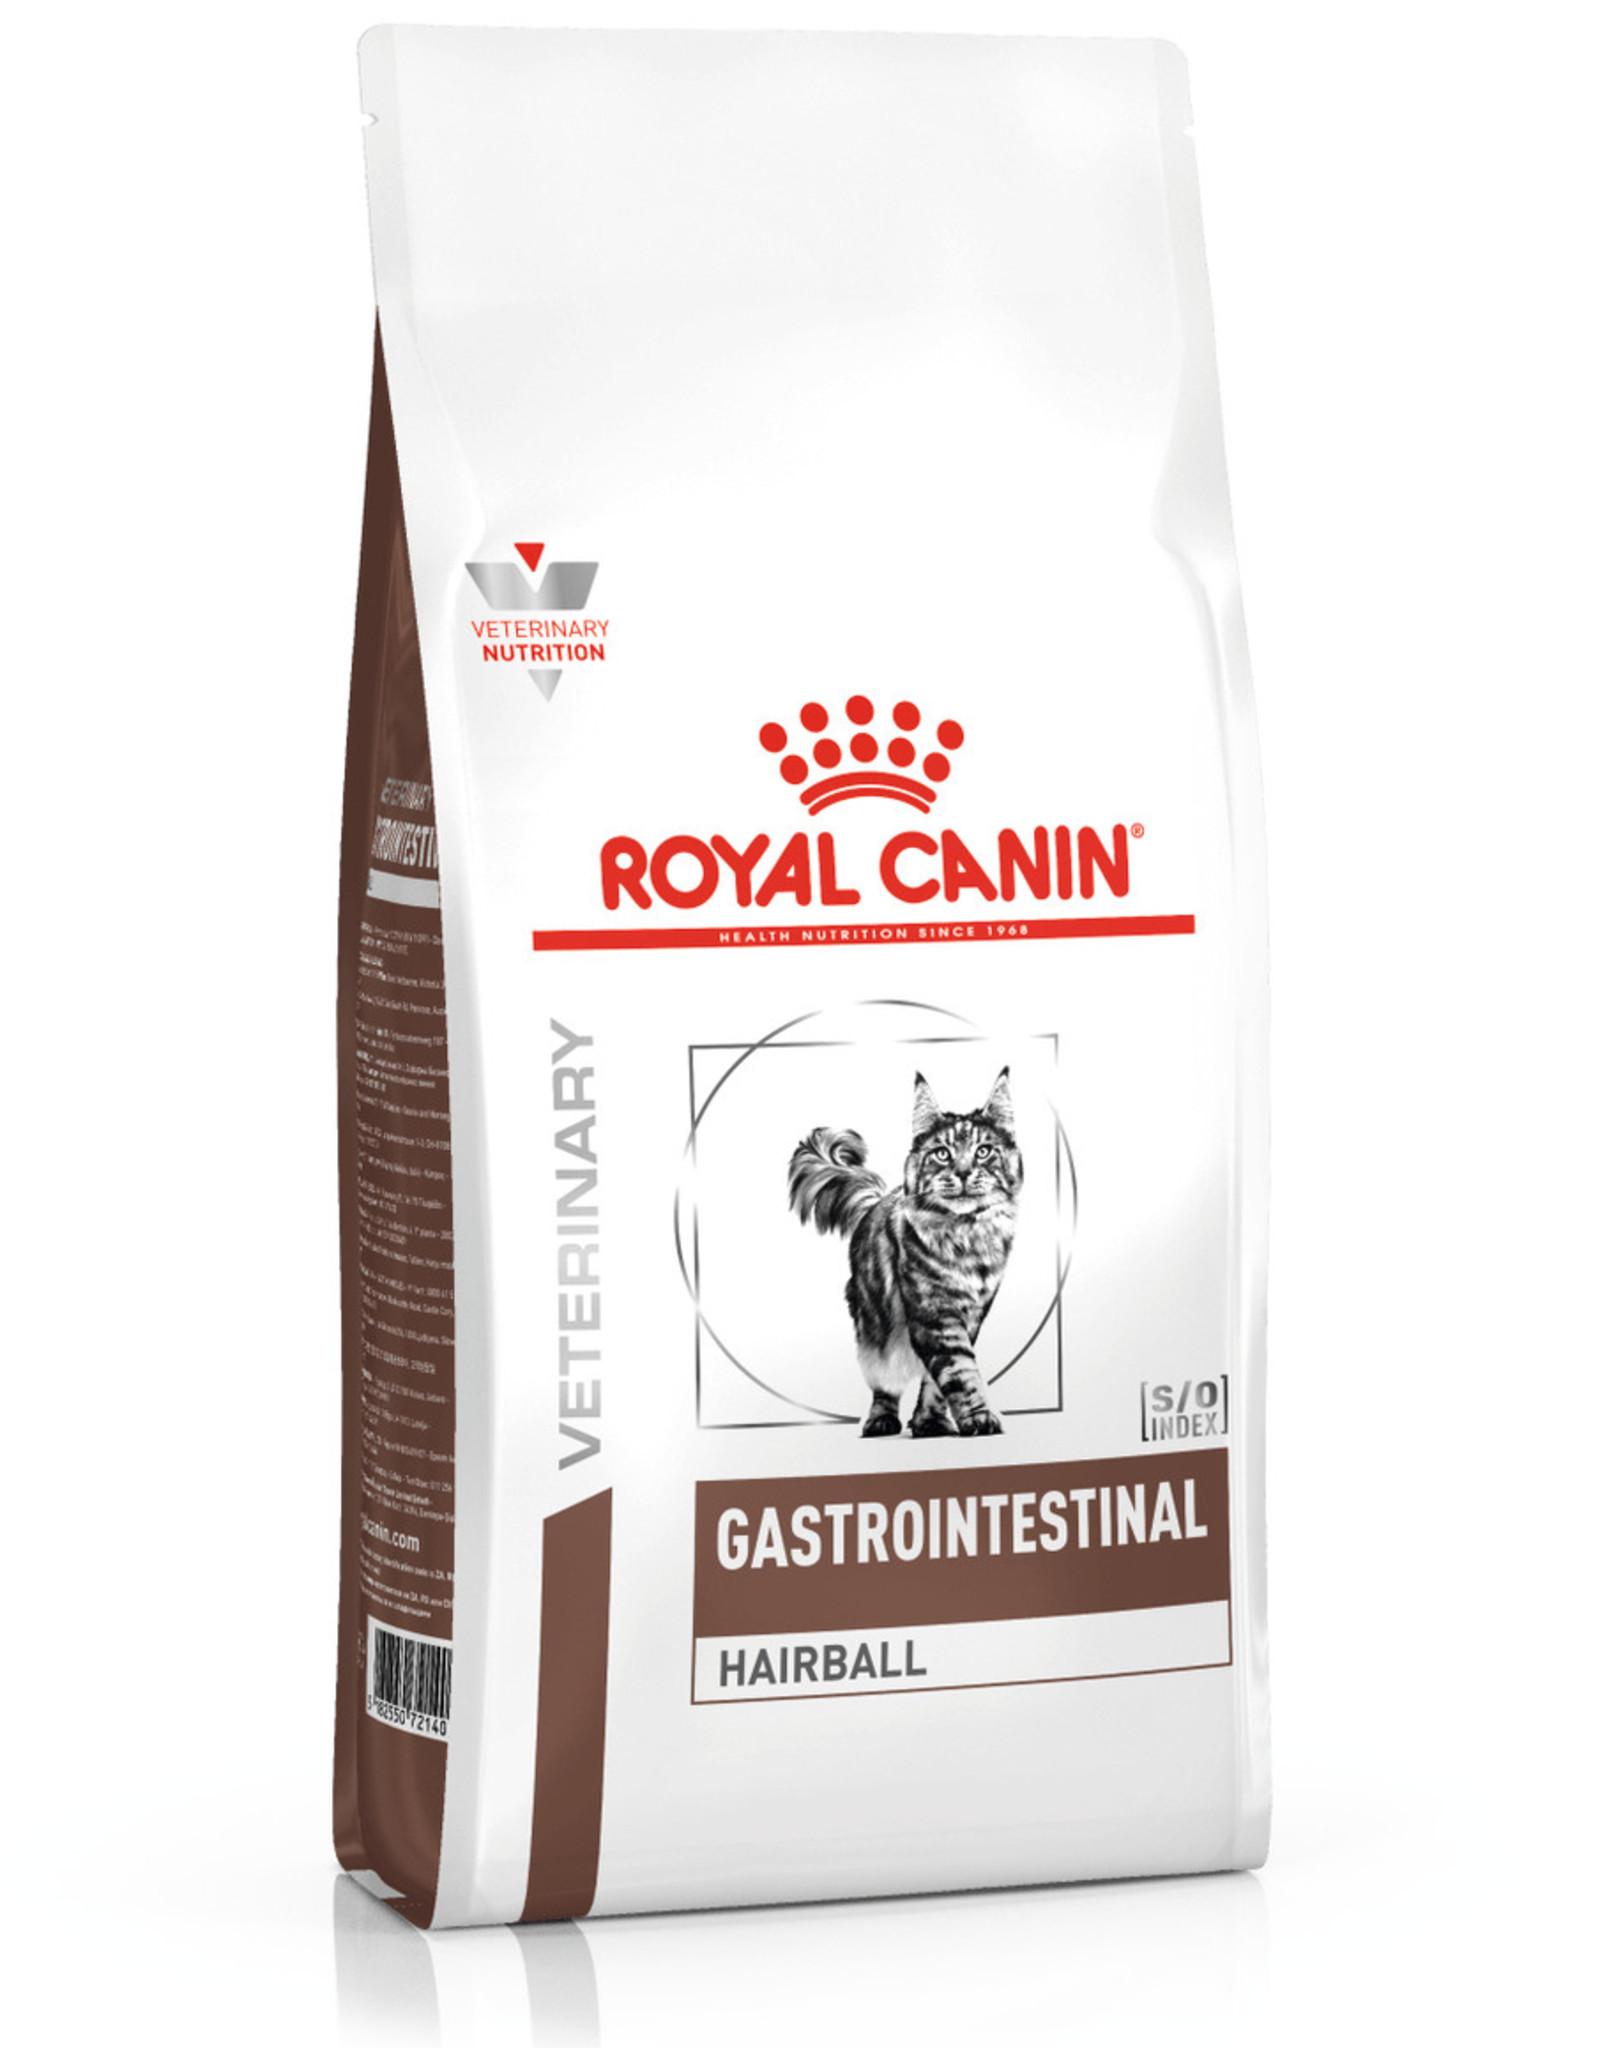 Royal Canin Royal Canin Gastro Intestinal Hairball Kat 4kg